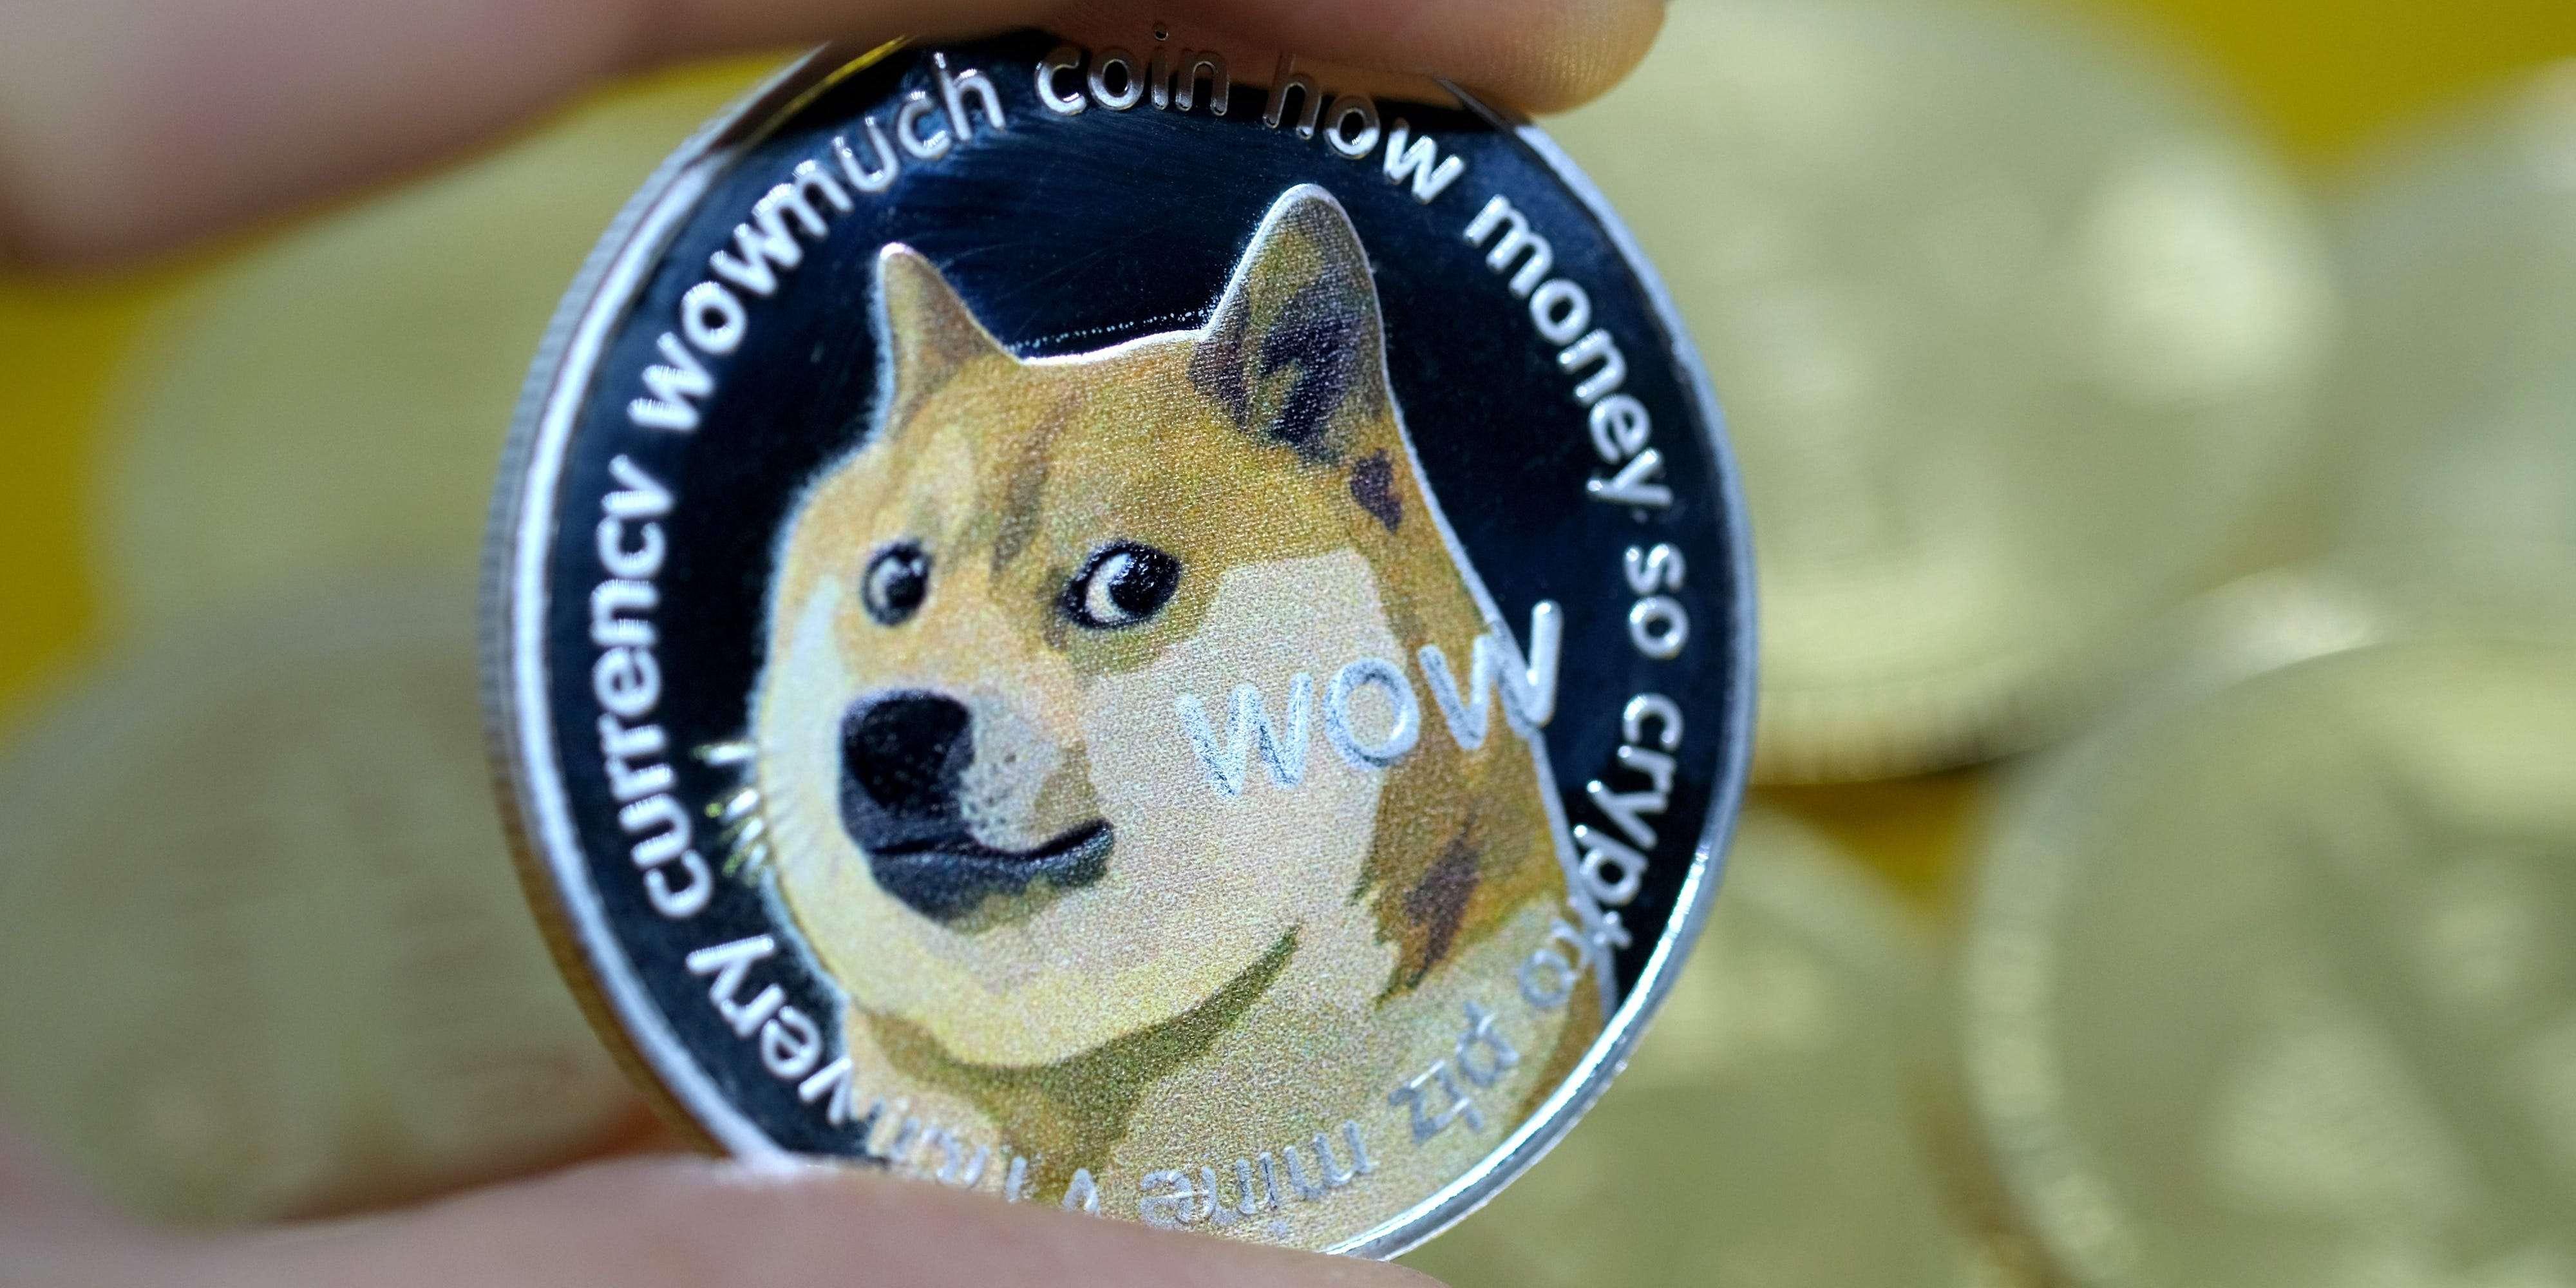 cfd handel flashback etrade kündigt bitcoin-handel an